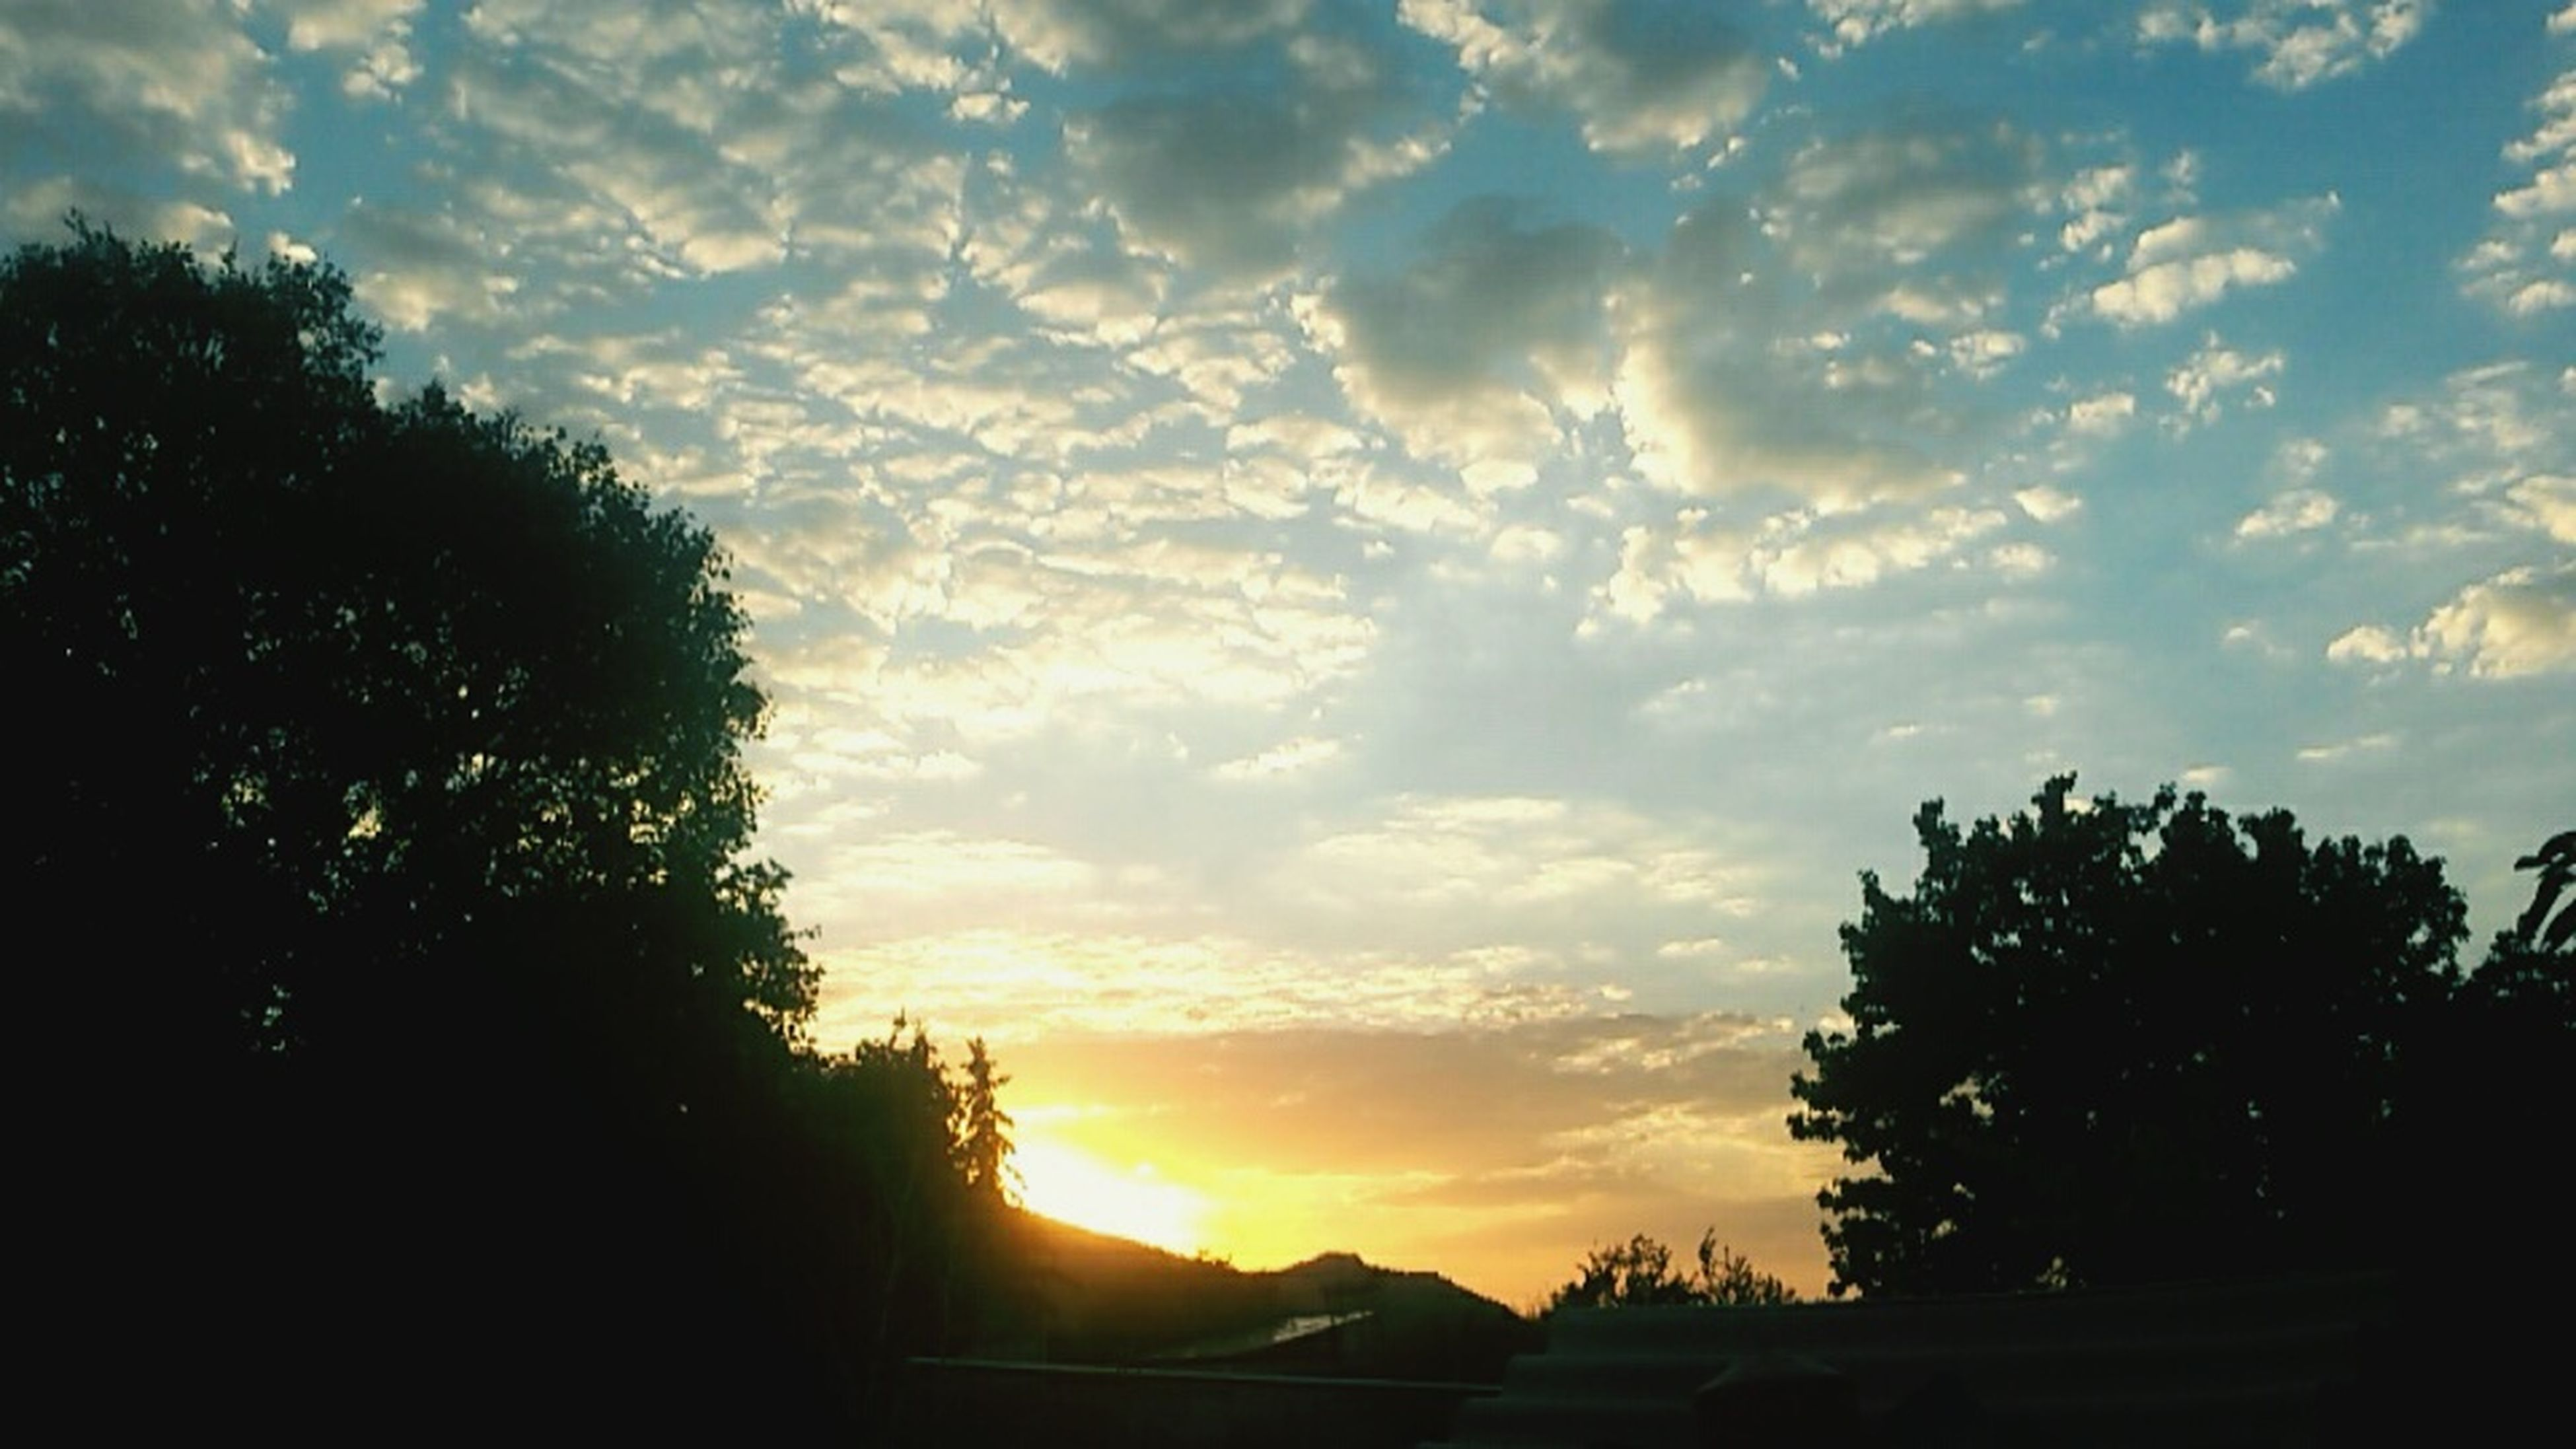 silhouette, sunset, sky, tree, beauty in nature, cloud - sky, scenics, tranquility, tranquil scene, nature, cloud, sun, sunlight, idyllic, orange color, cloudy, landscape, outdoors, sunbeam, no people, outline, dramatic sky, growth, dark, non-urban scene, non urban scene, majestic